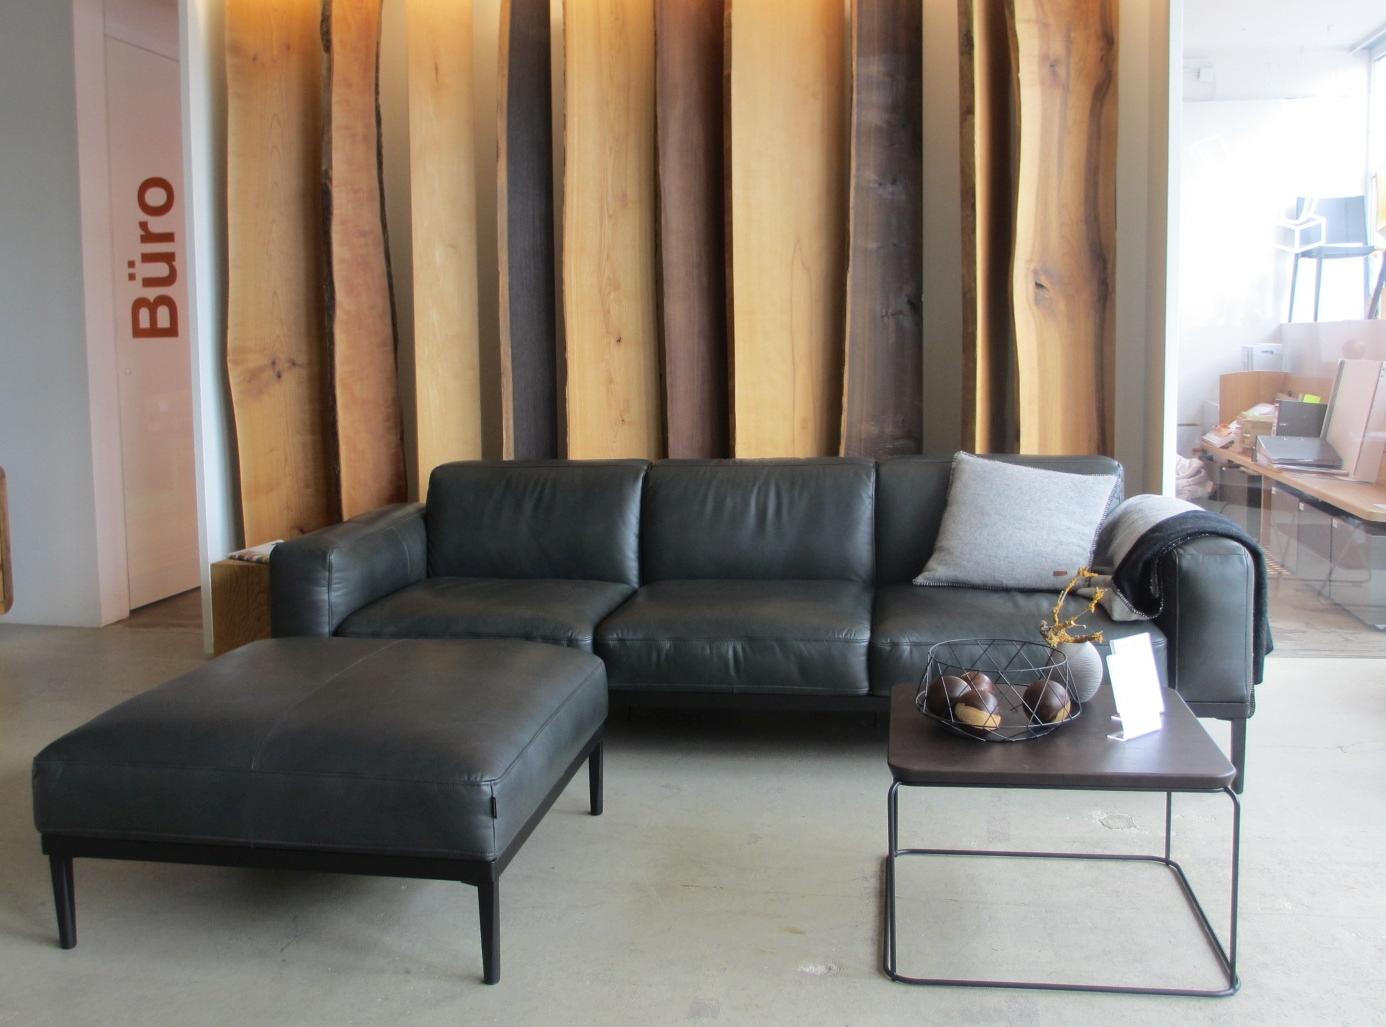 abverkauf freistil rolf benz ausstellungsm bel. Black Bedroom Furniture Sets. Home Design Ideas